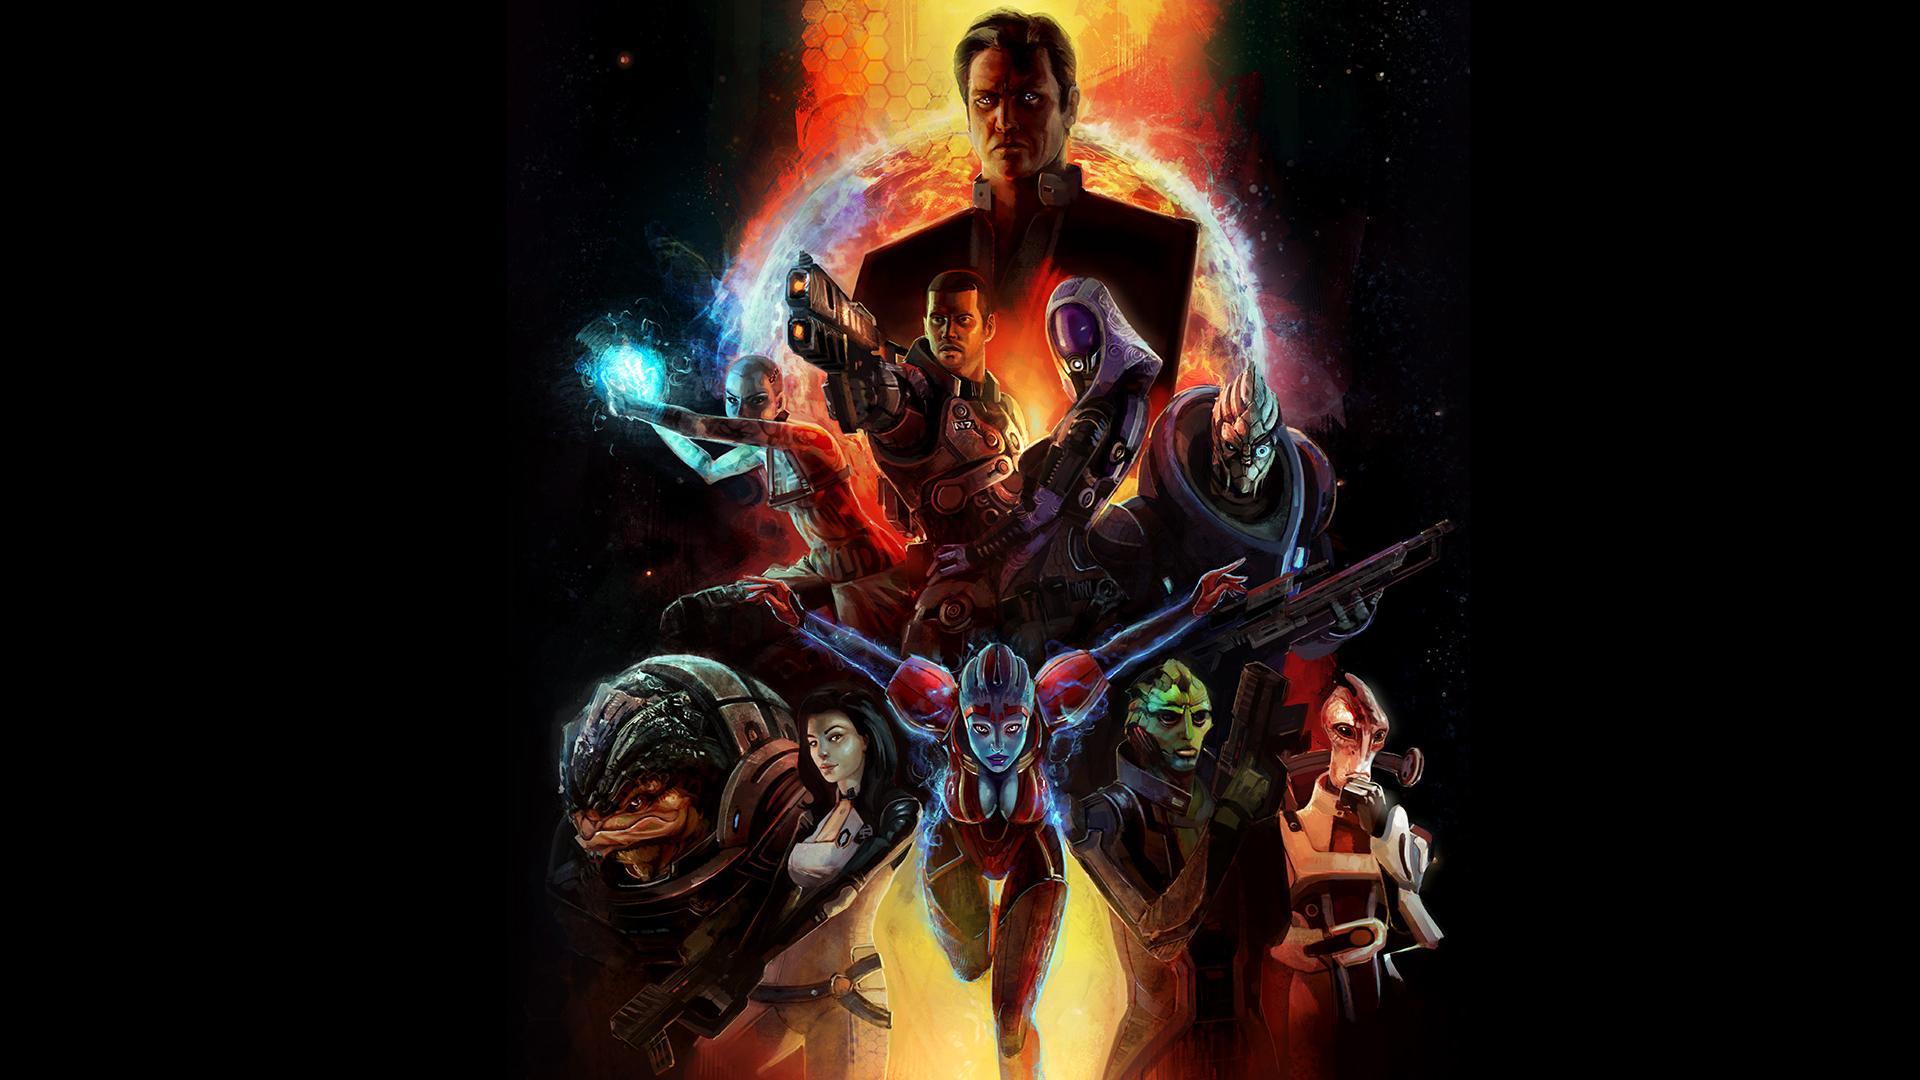 2560x1440 Mass Effect 2 Hd 1440p Resolution Hd 4k Wallpapers Images